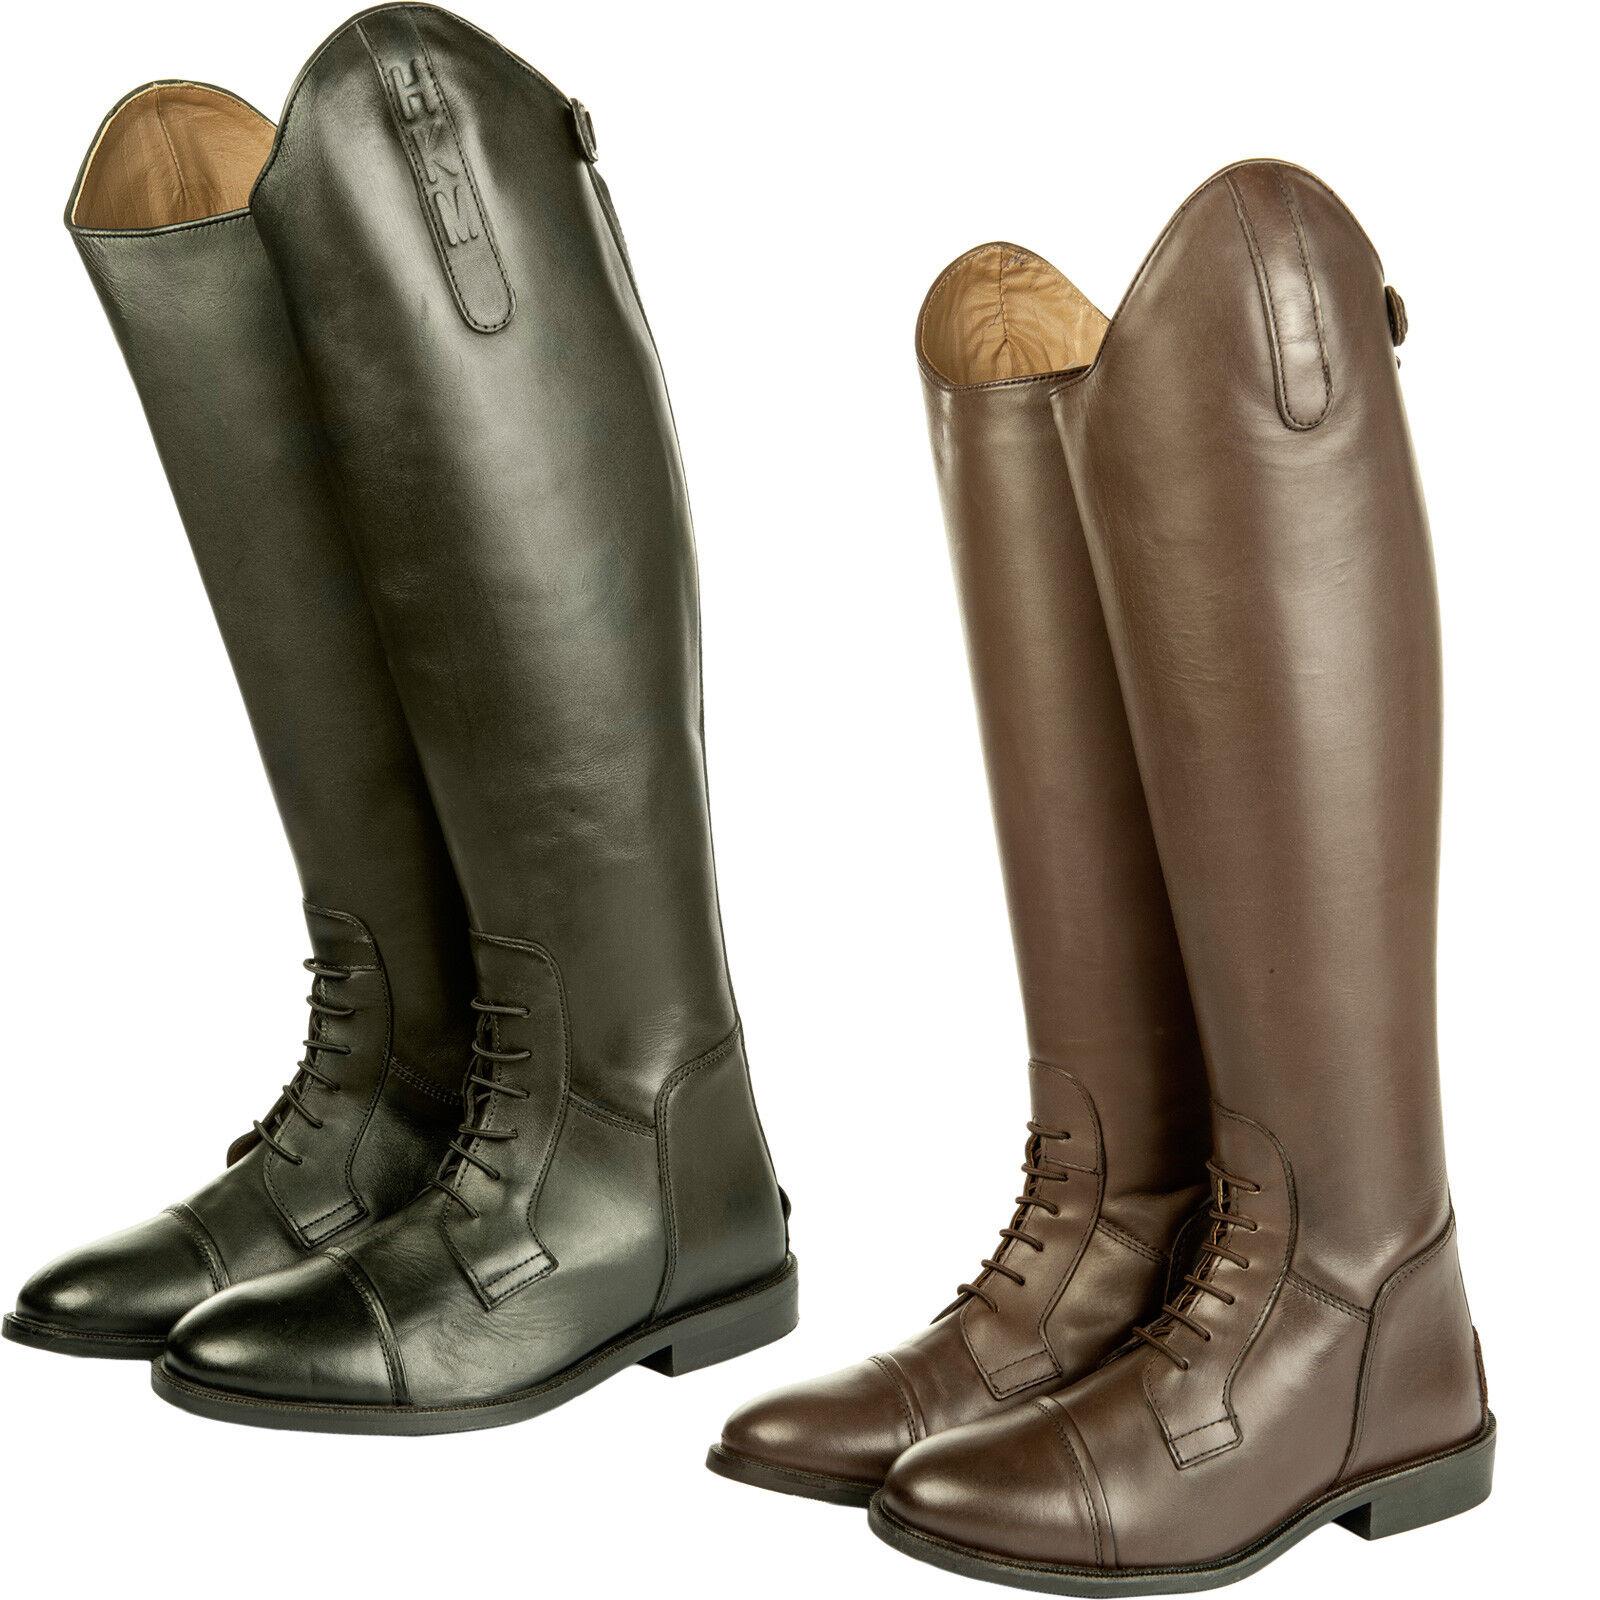 Reitbotas-spain-, Soft cuero-corta ancho estándar-HKM